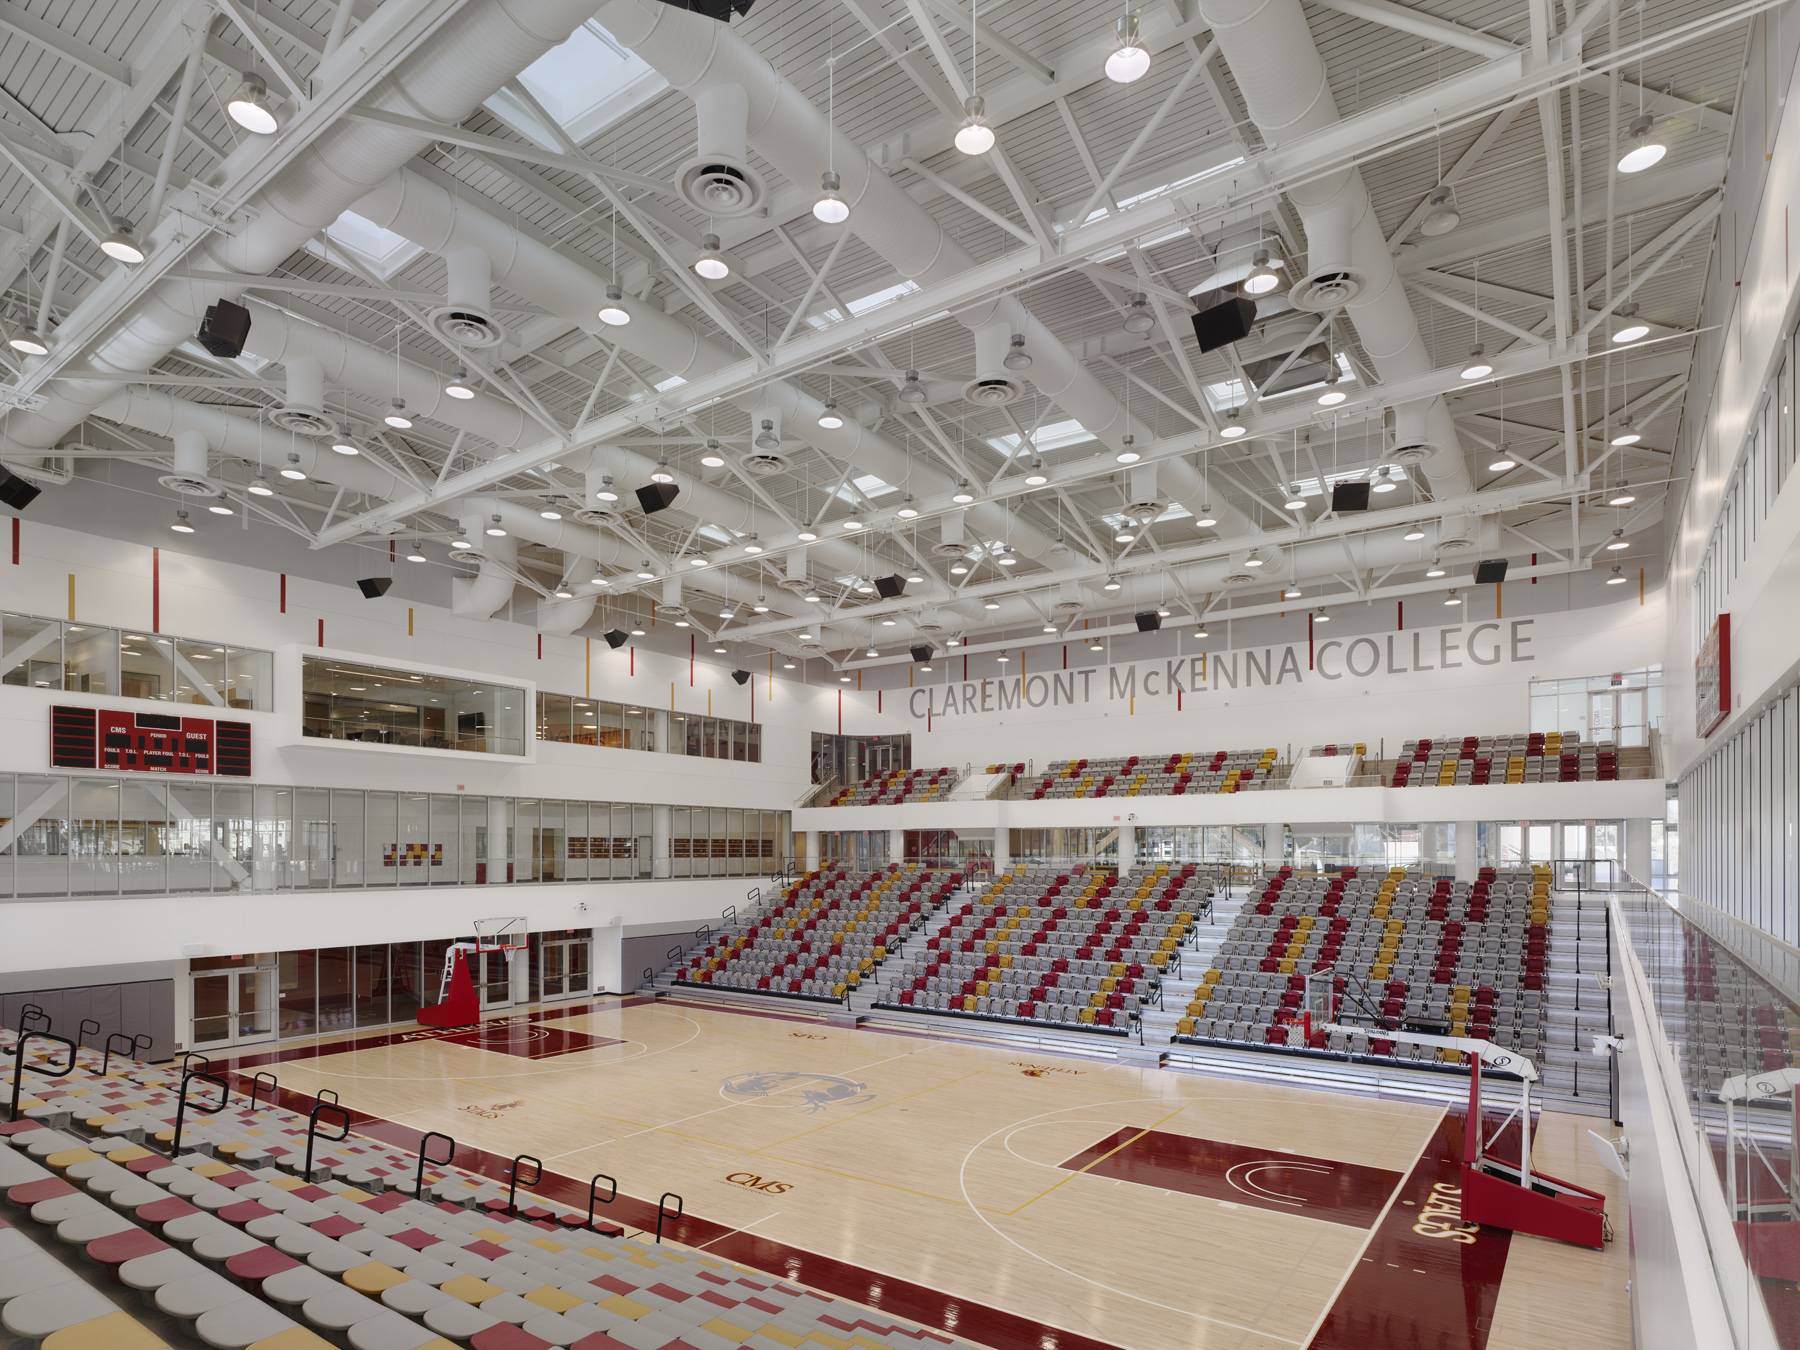 Arena from northeast corner